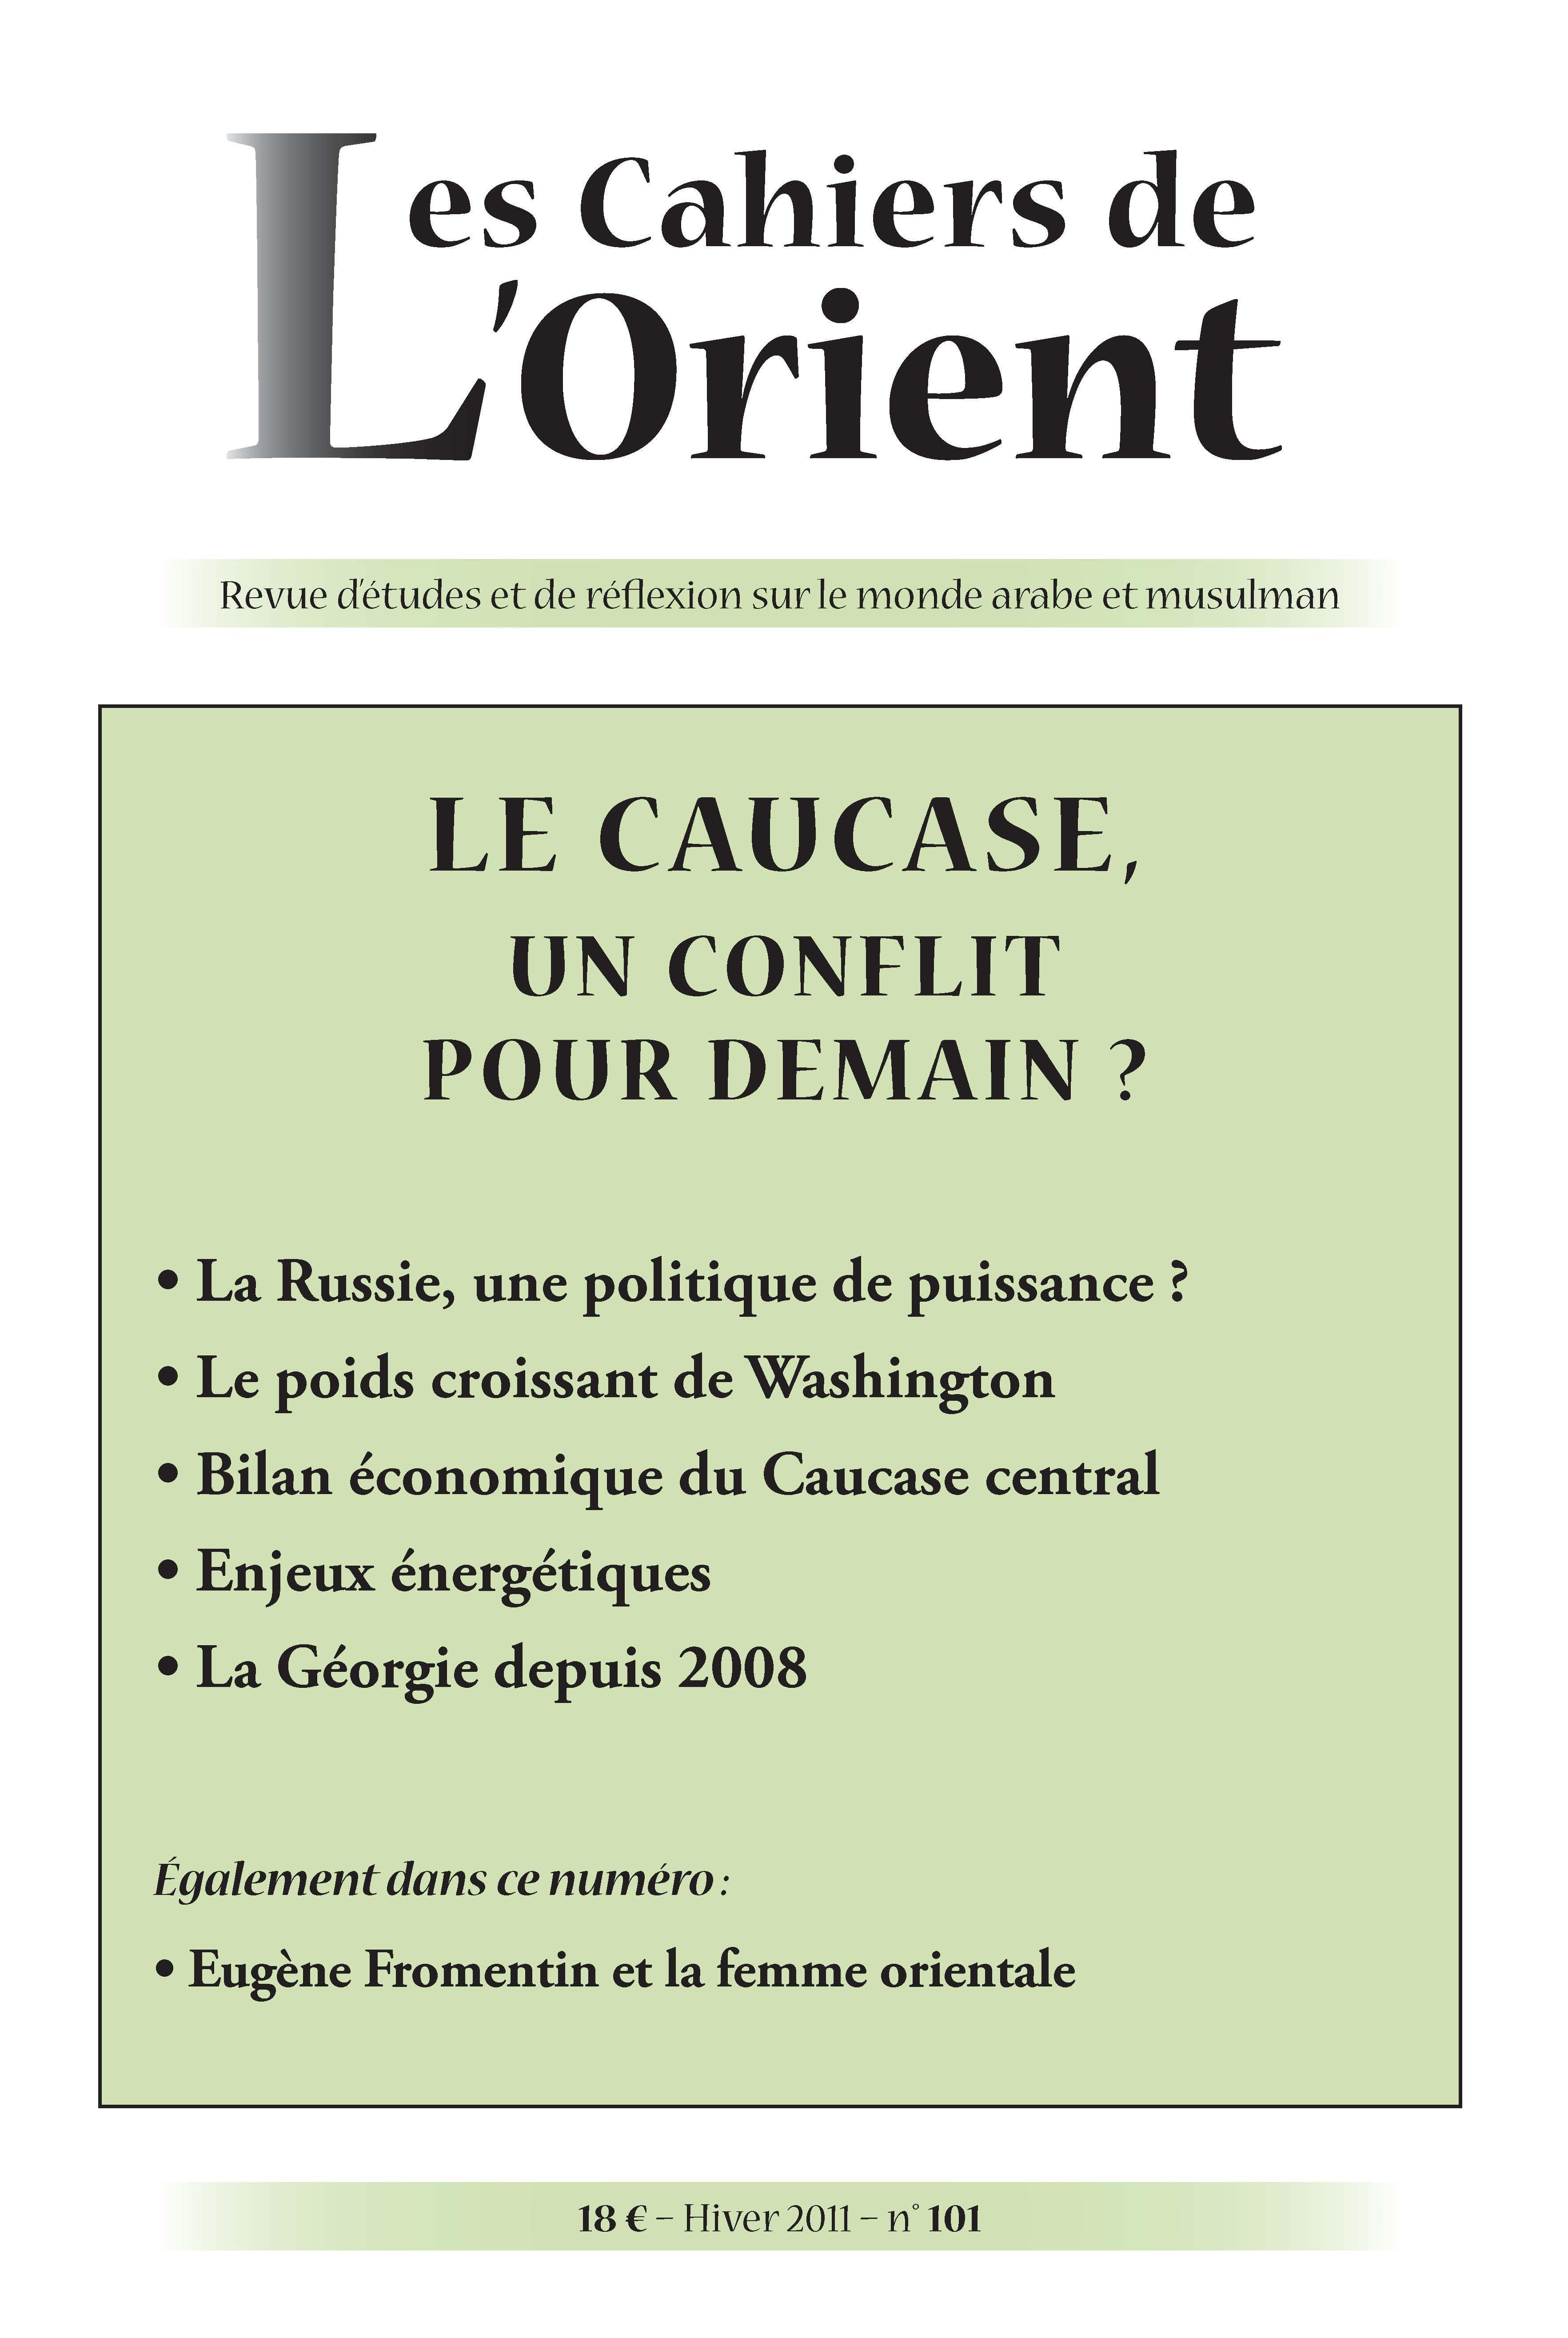 Eugène Fromentin : du Sahel au Sahara | Cairn.info